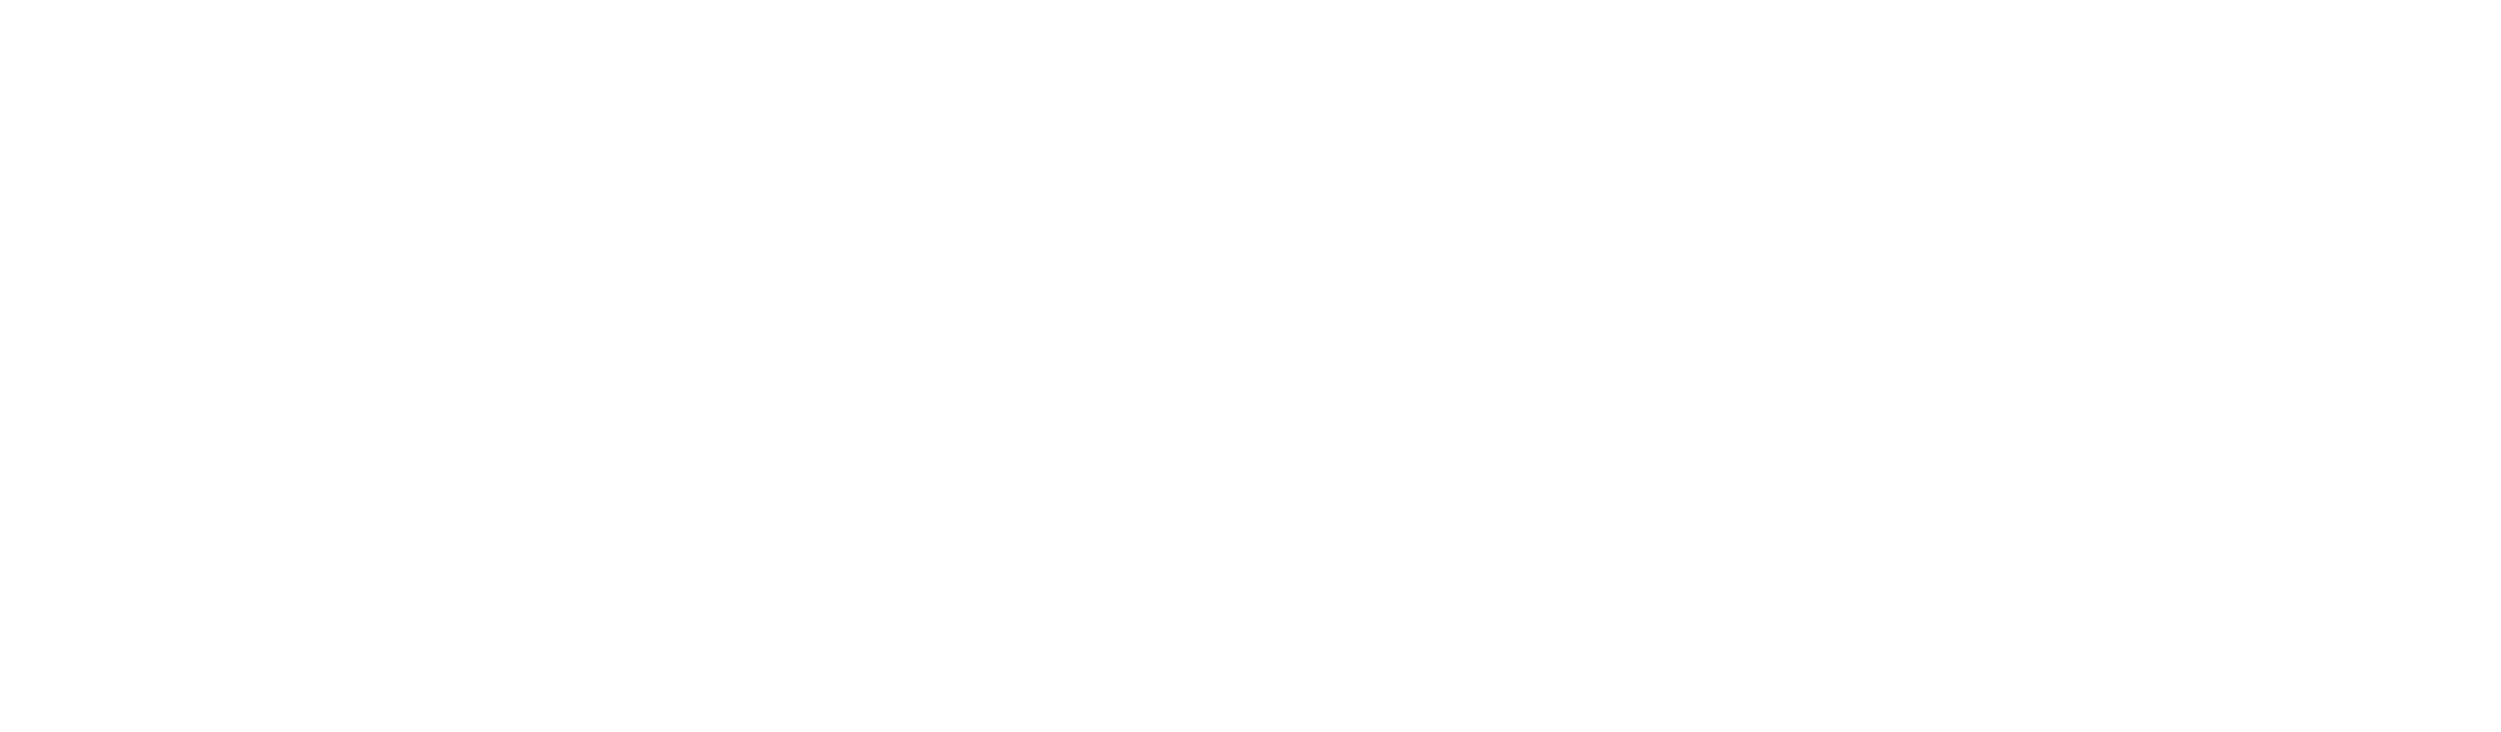 BlockImagingLogo-04